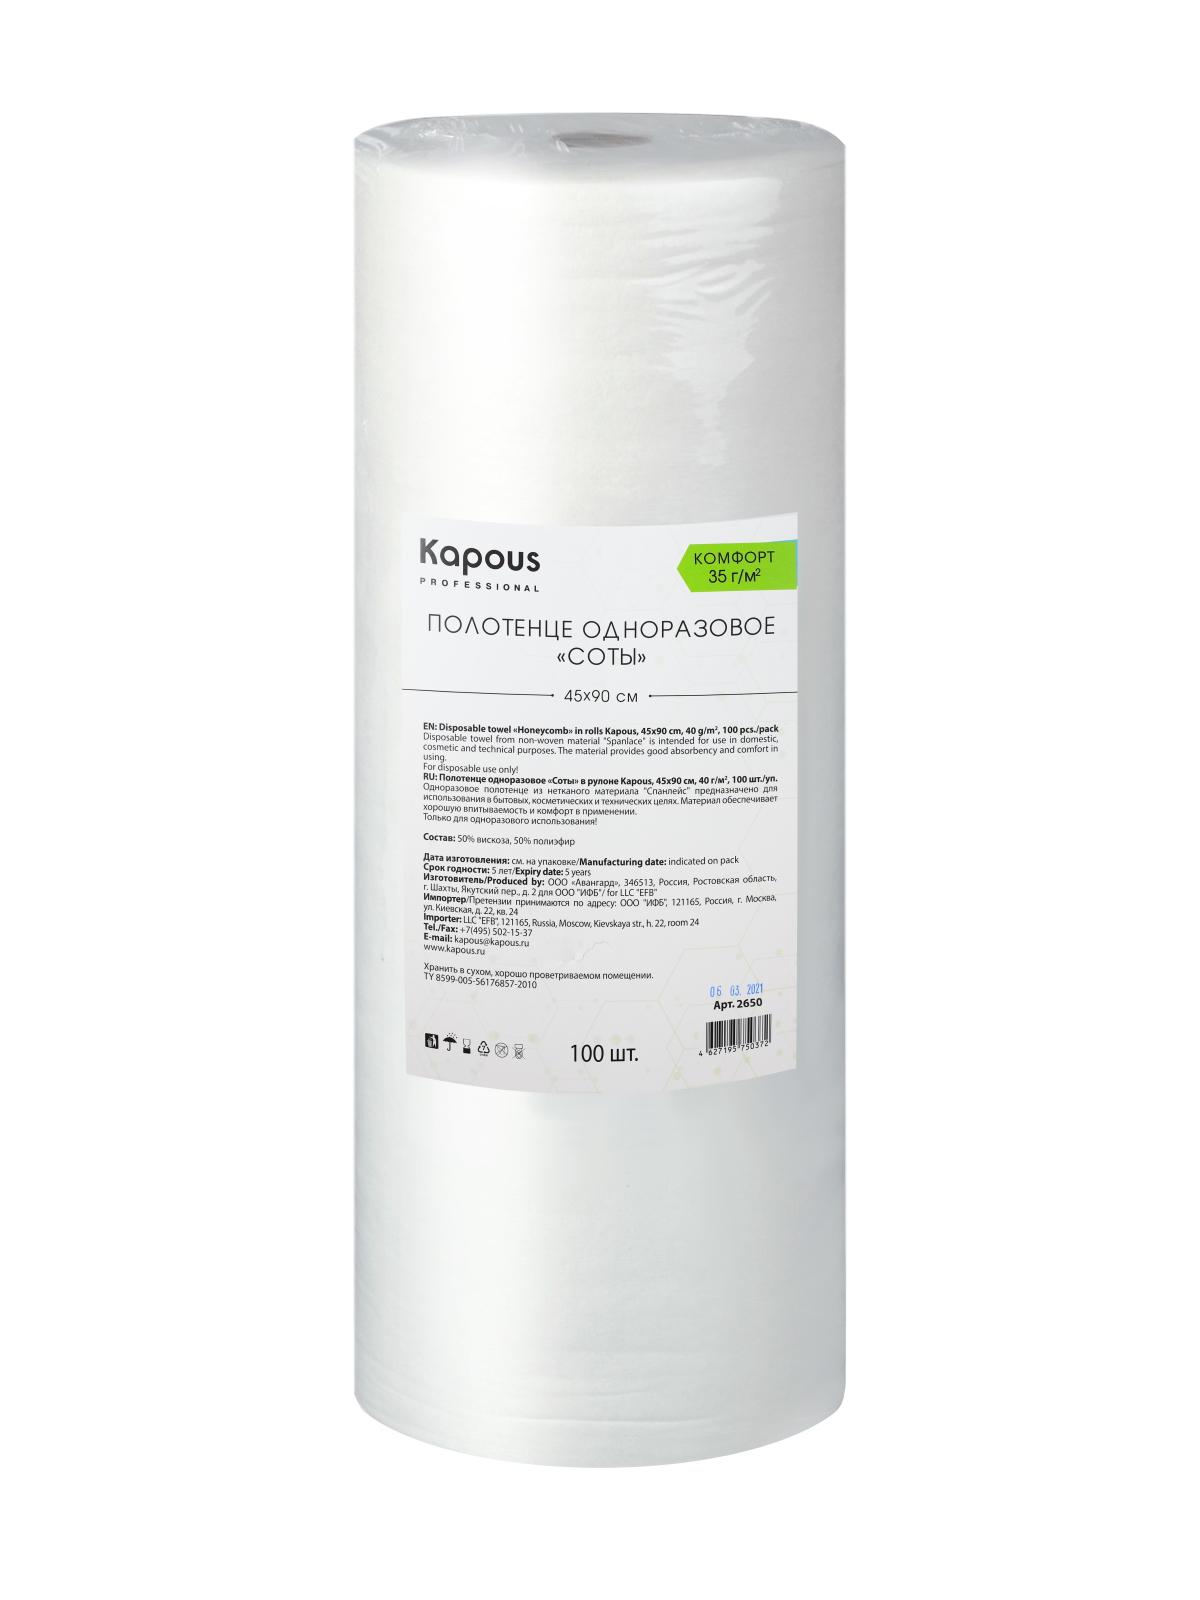 Купить Полотенце одноразовое KAPOUS PROFESSIONAL соты в рулоне 45 х 90 см 35г/м2 100 шт